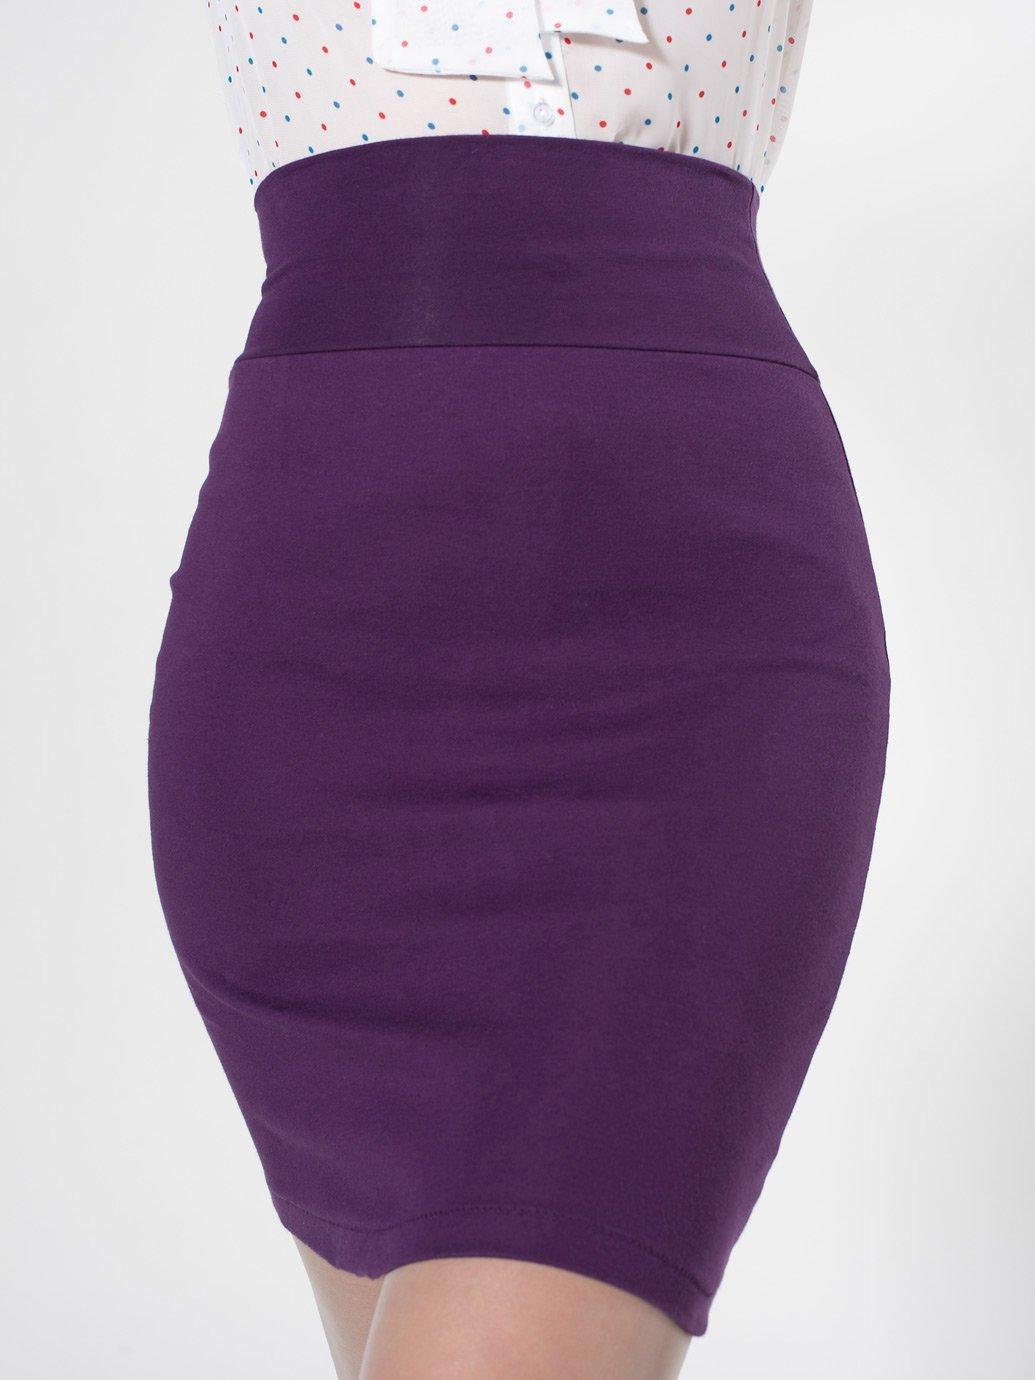 b93ca01df07 ... American Apparel Interlock Pencil Skirt Female Purple ...